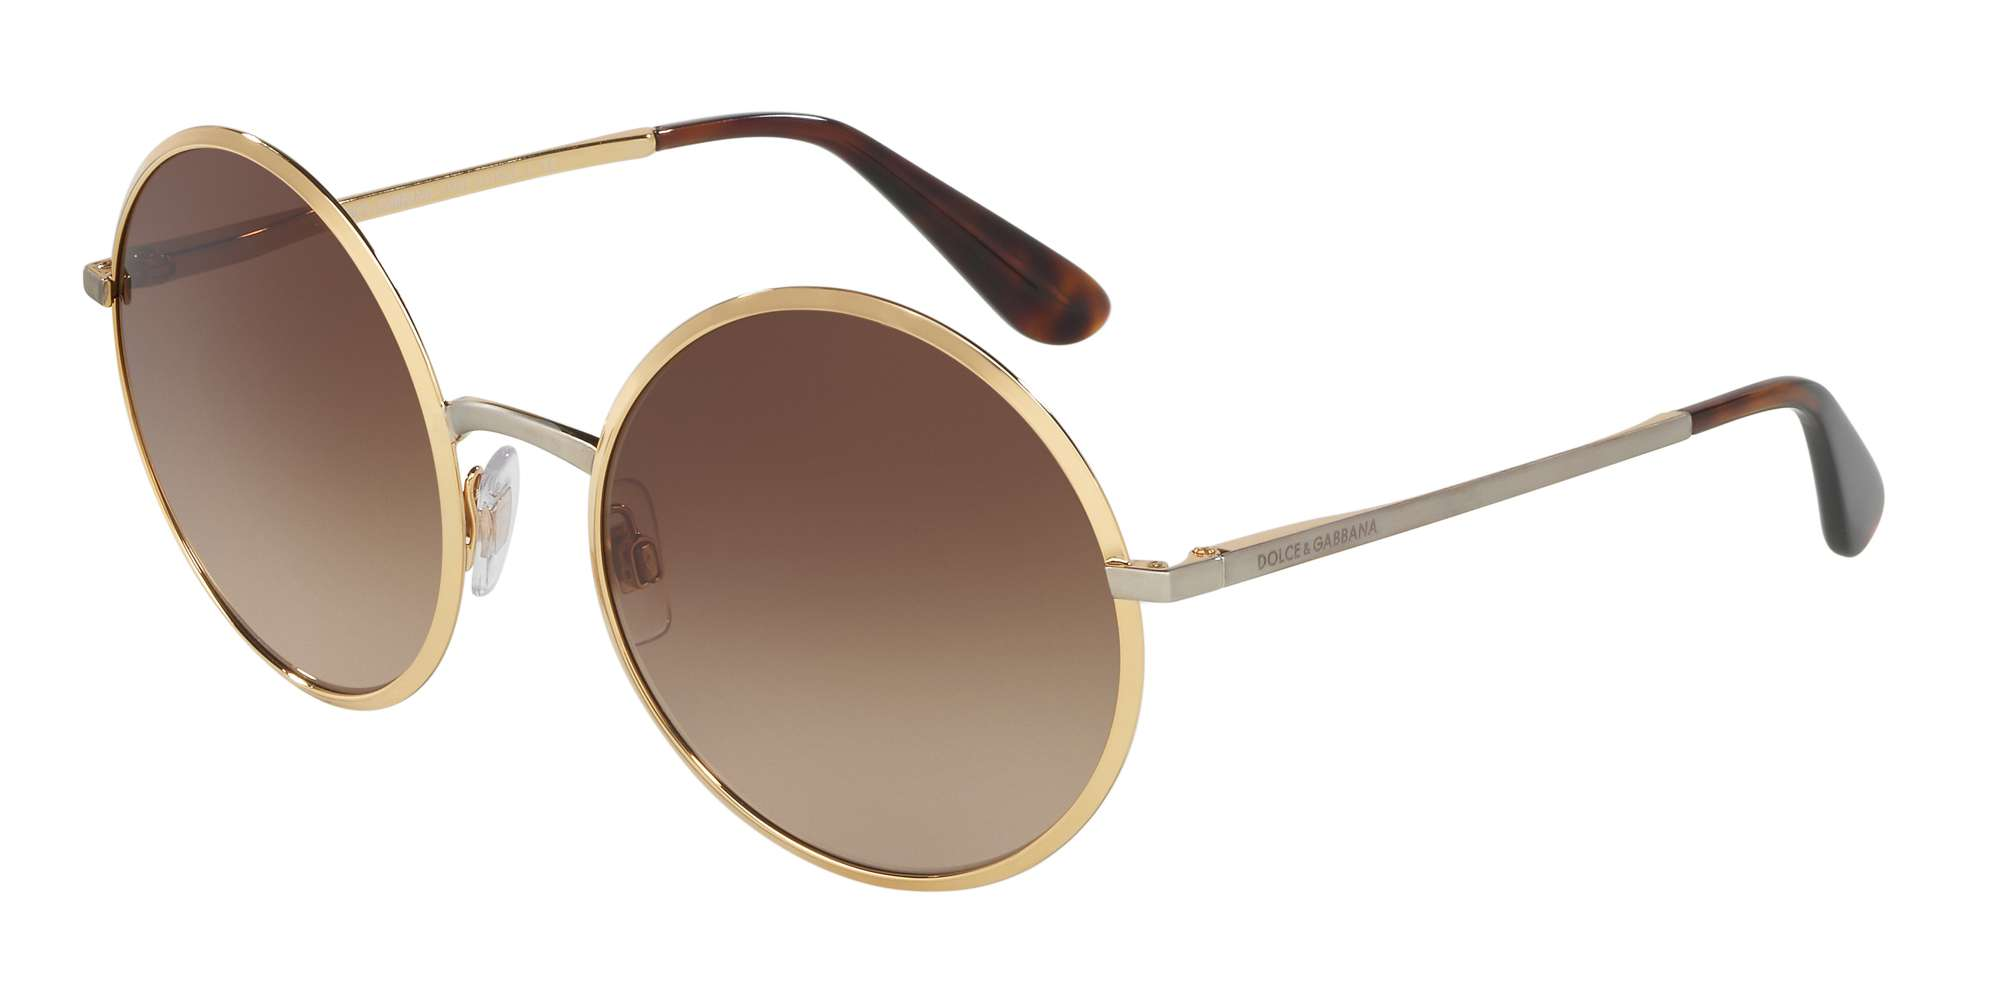 GOLD / BROWN GRADIENT lenses